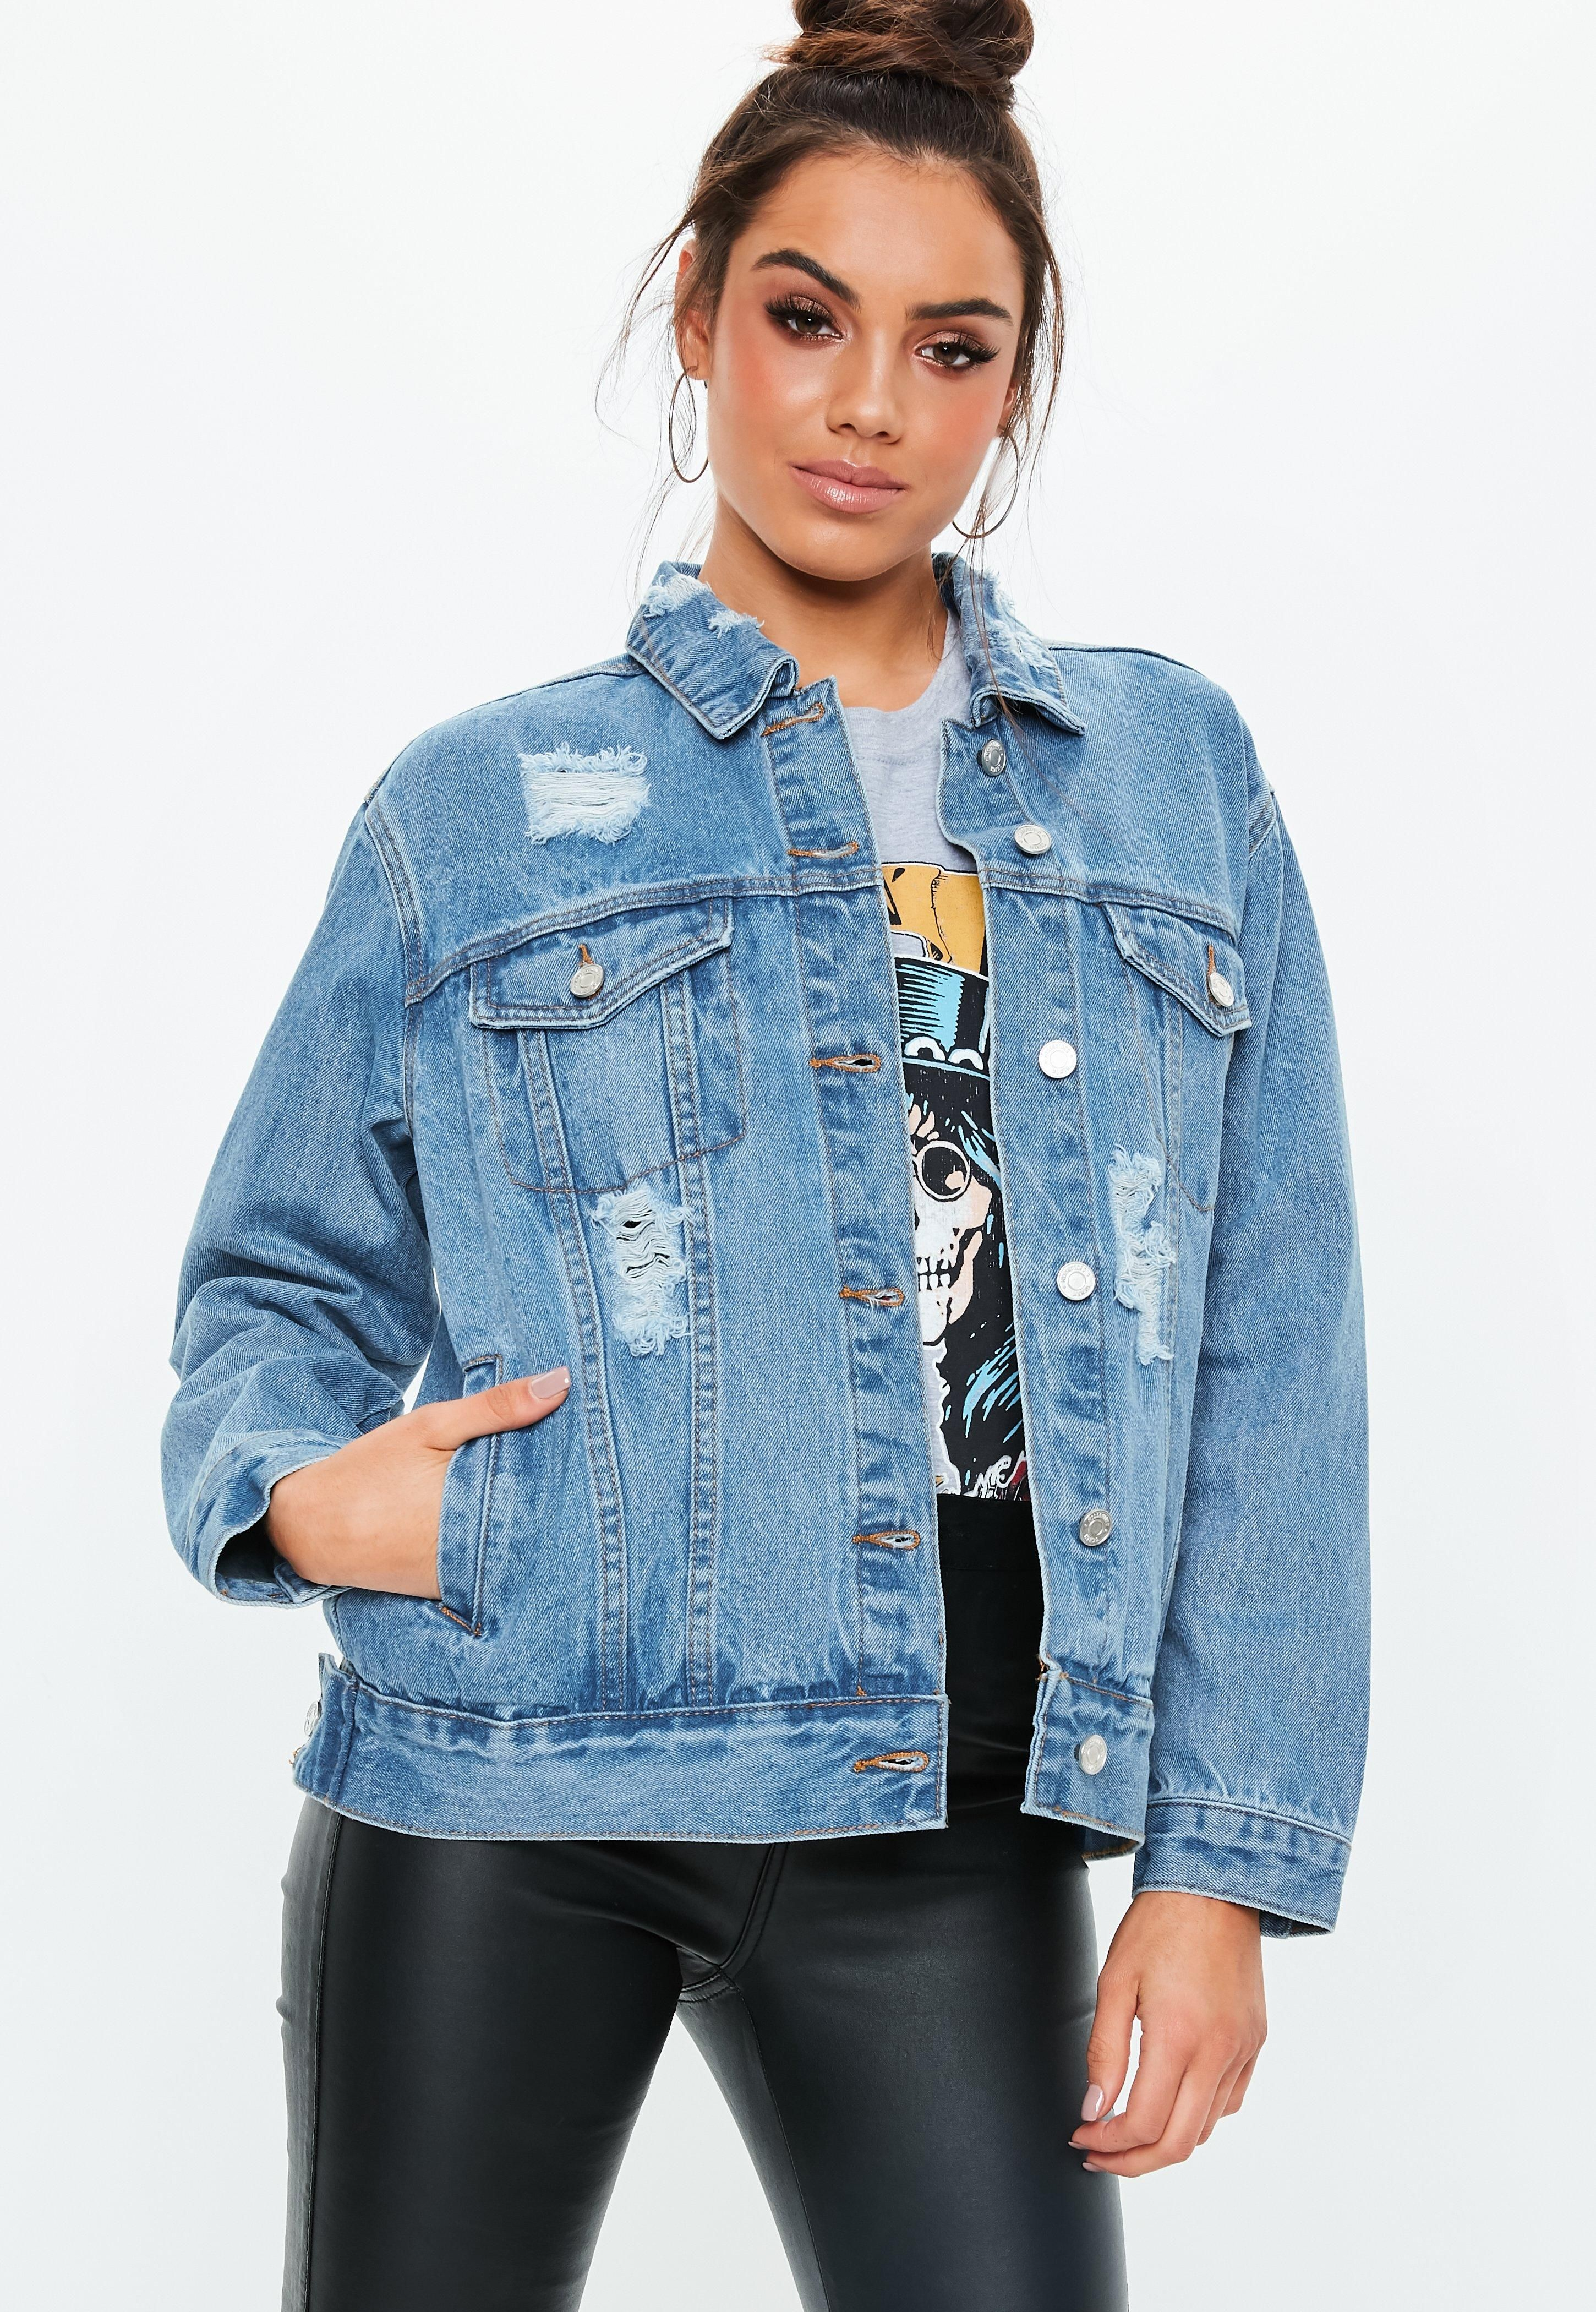 Judas Lee Zara Oriental Print Loose Jacket, Wrangler